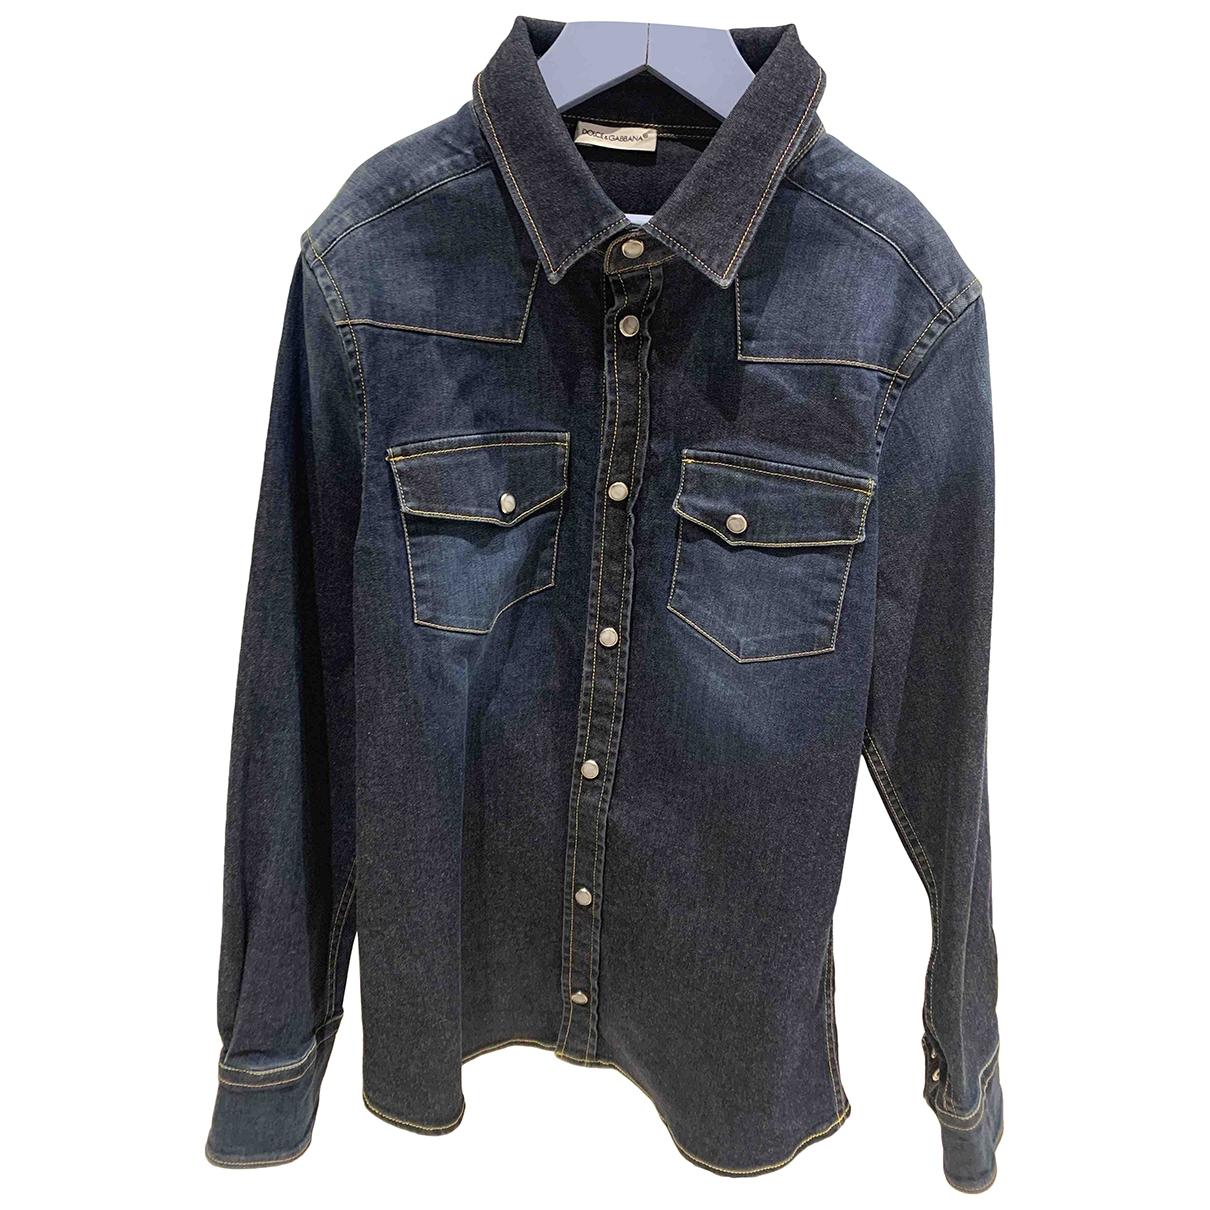 Dolce & Gabbana \N Jacke, Maentel in  Blau Denim - Jeans